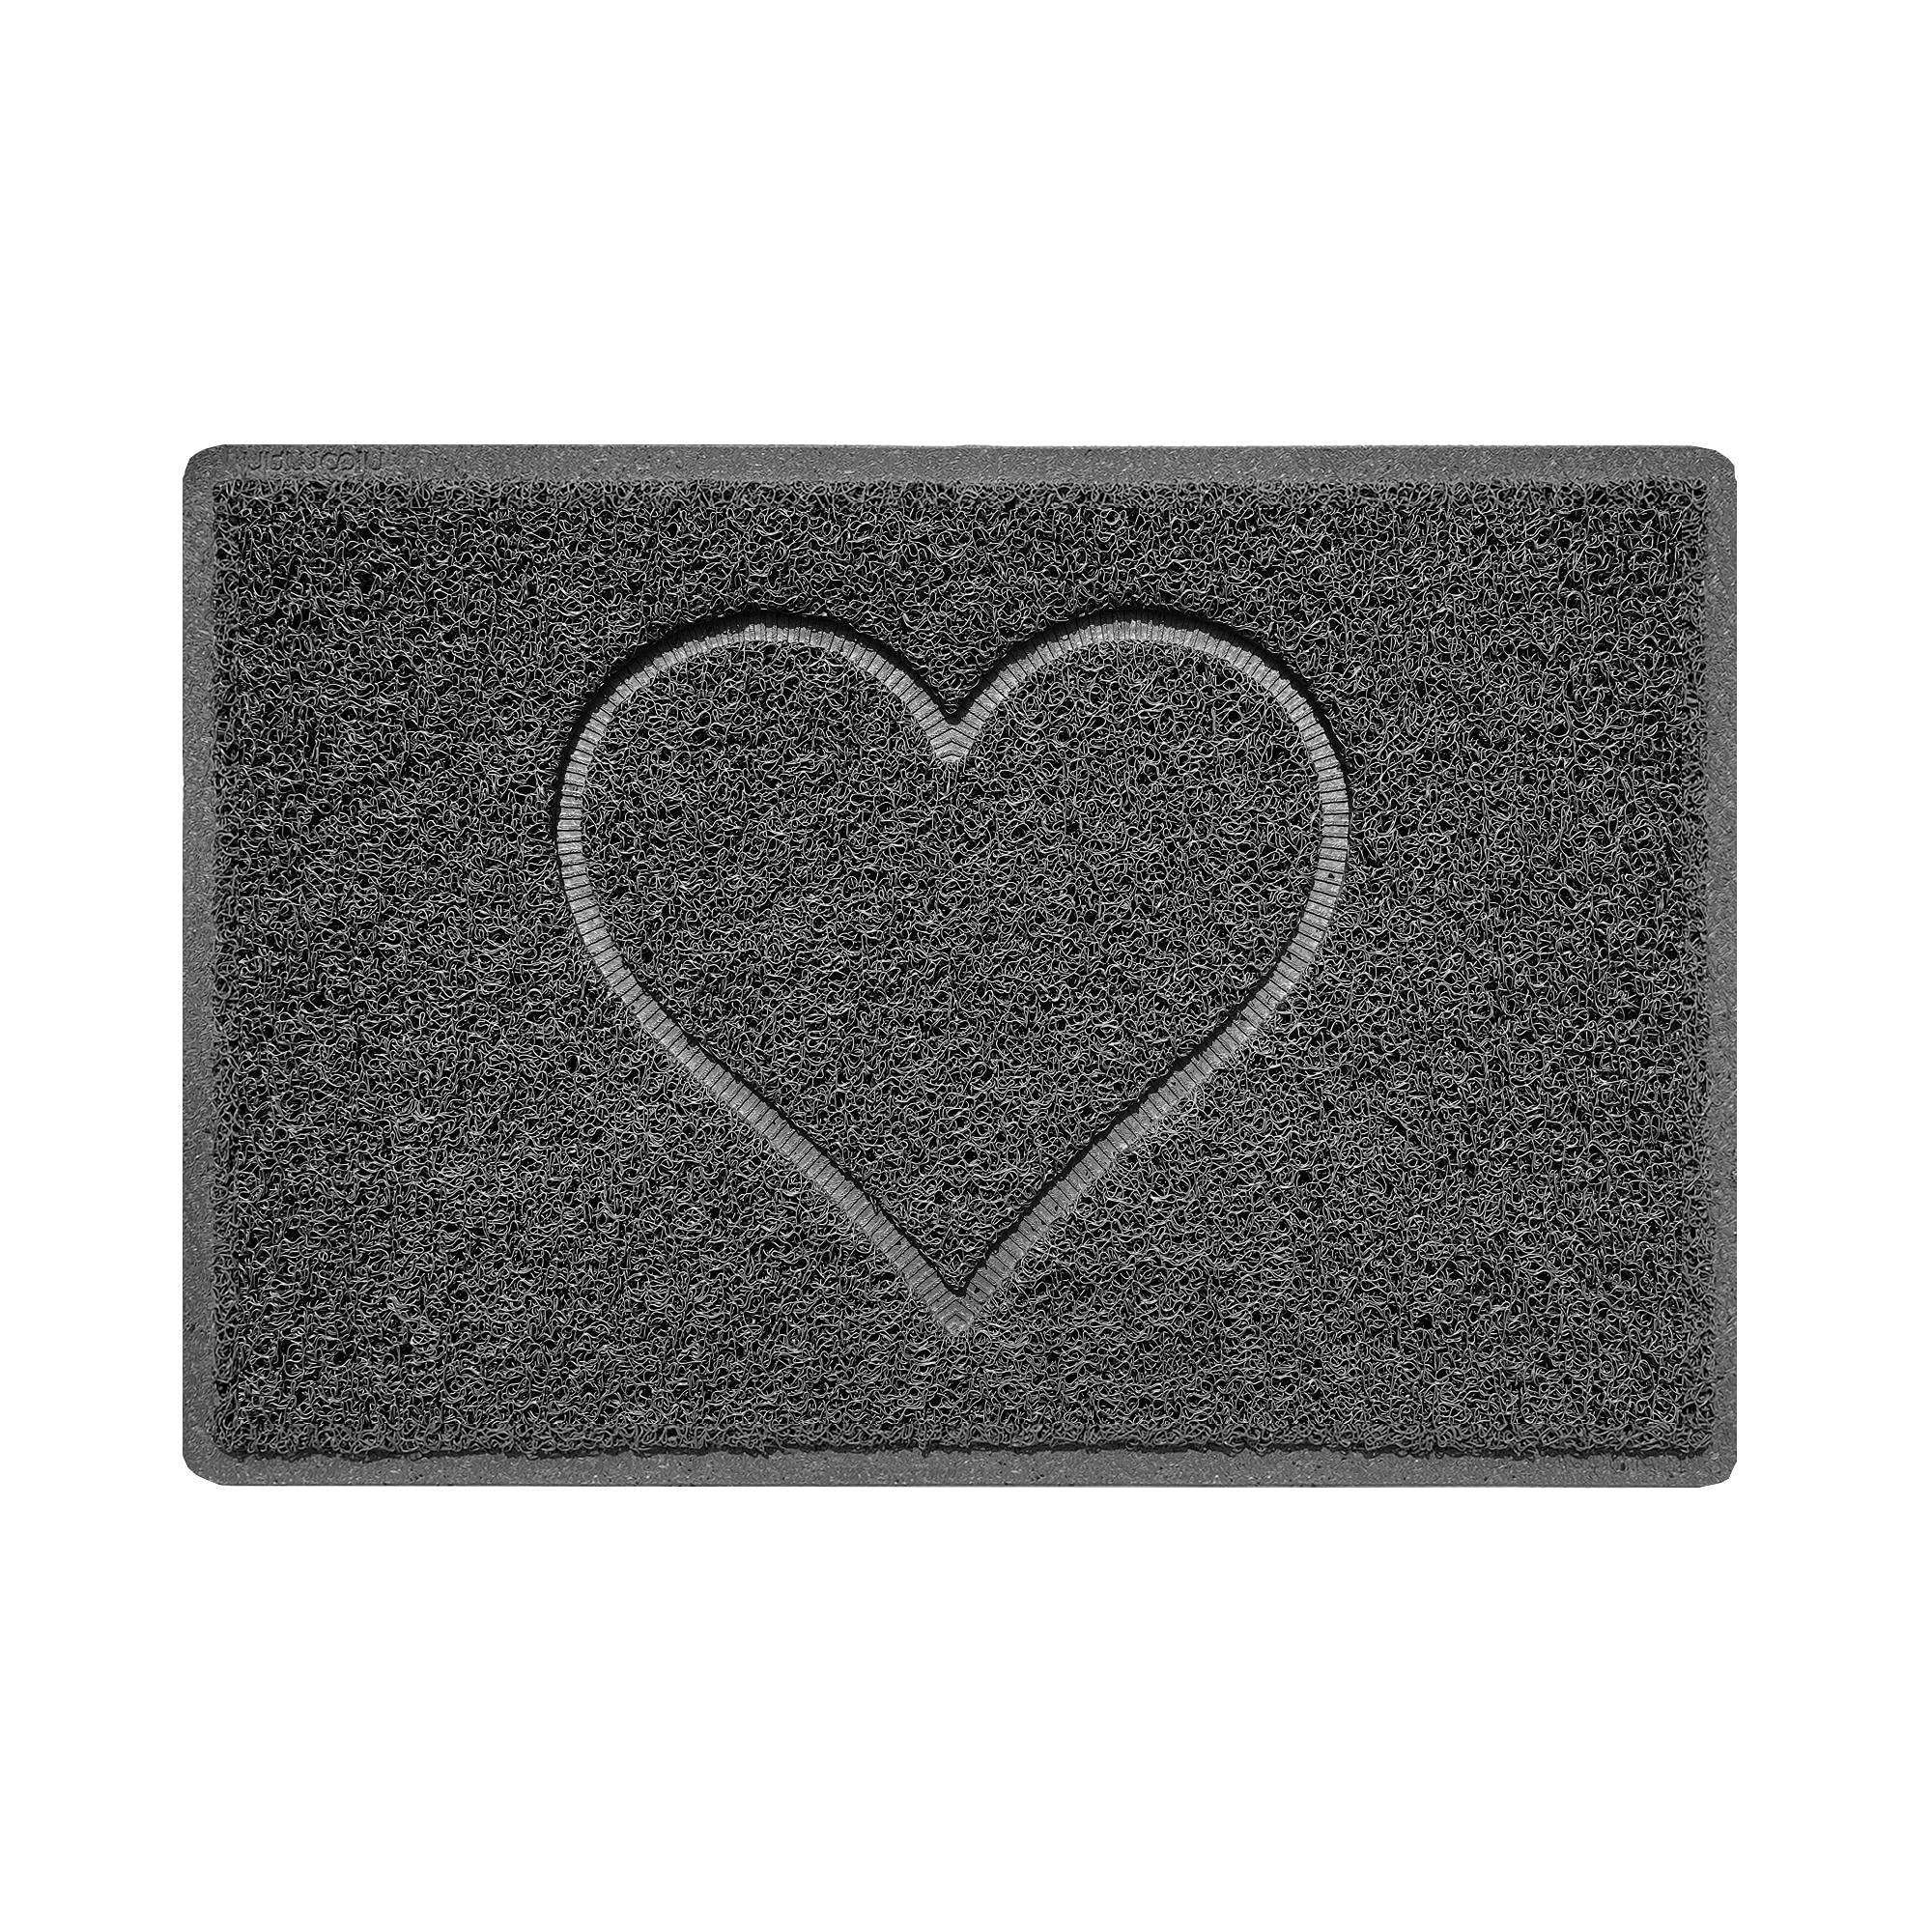 Nicoman Heart Embossed Shape Door Mat Dirt-Trapper Washable Barrier Doormat-Dark Grey (Watertight Rubber-Back)-Small (60x40cm)